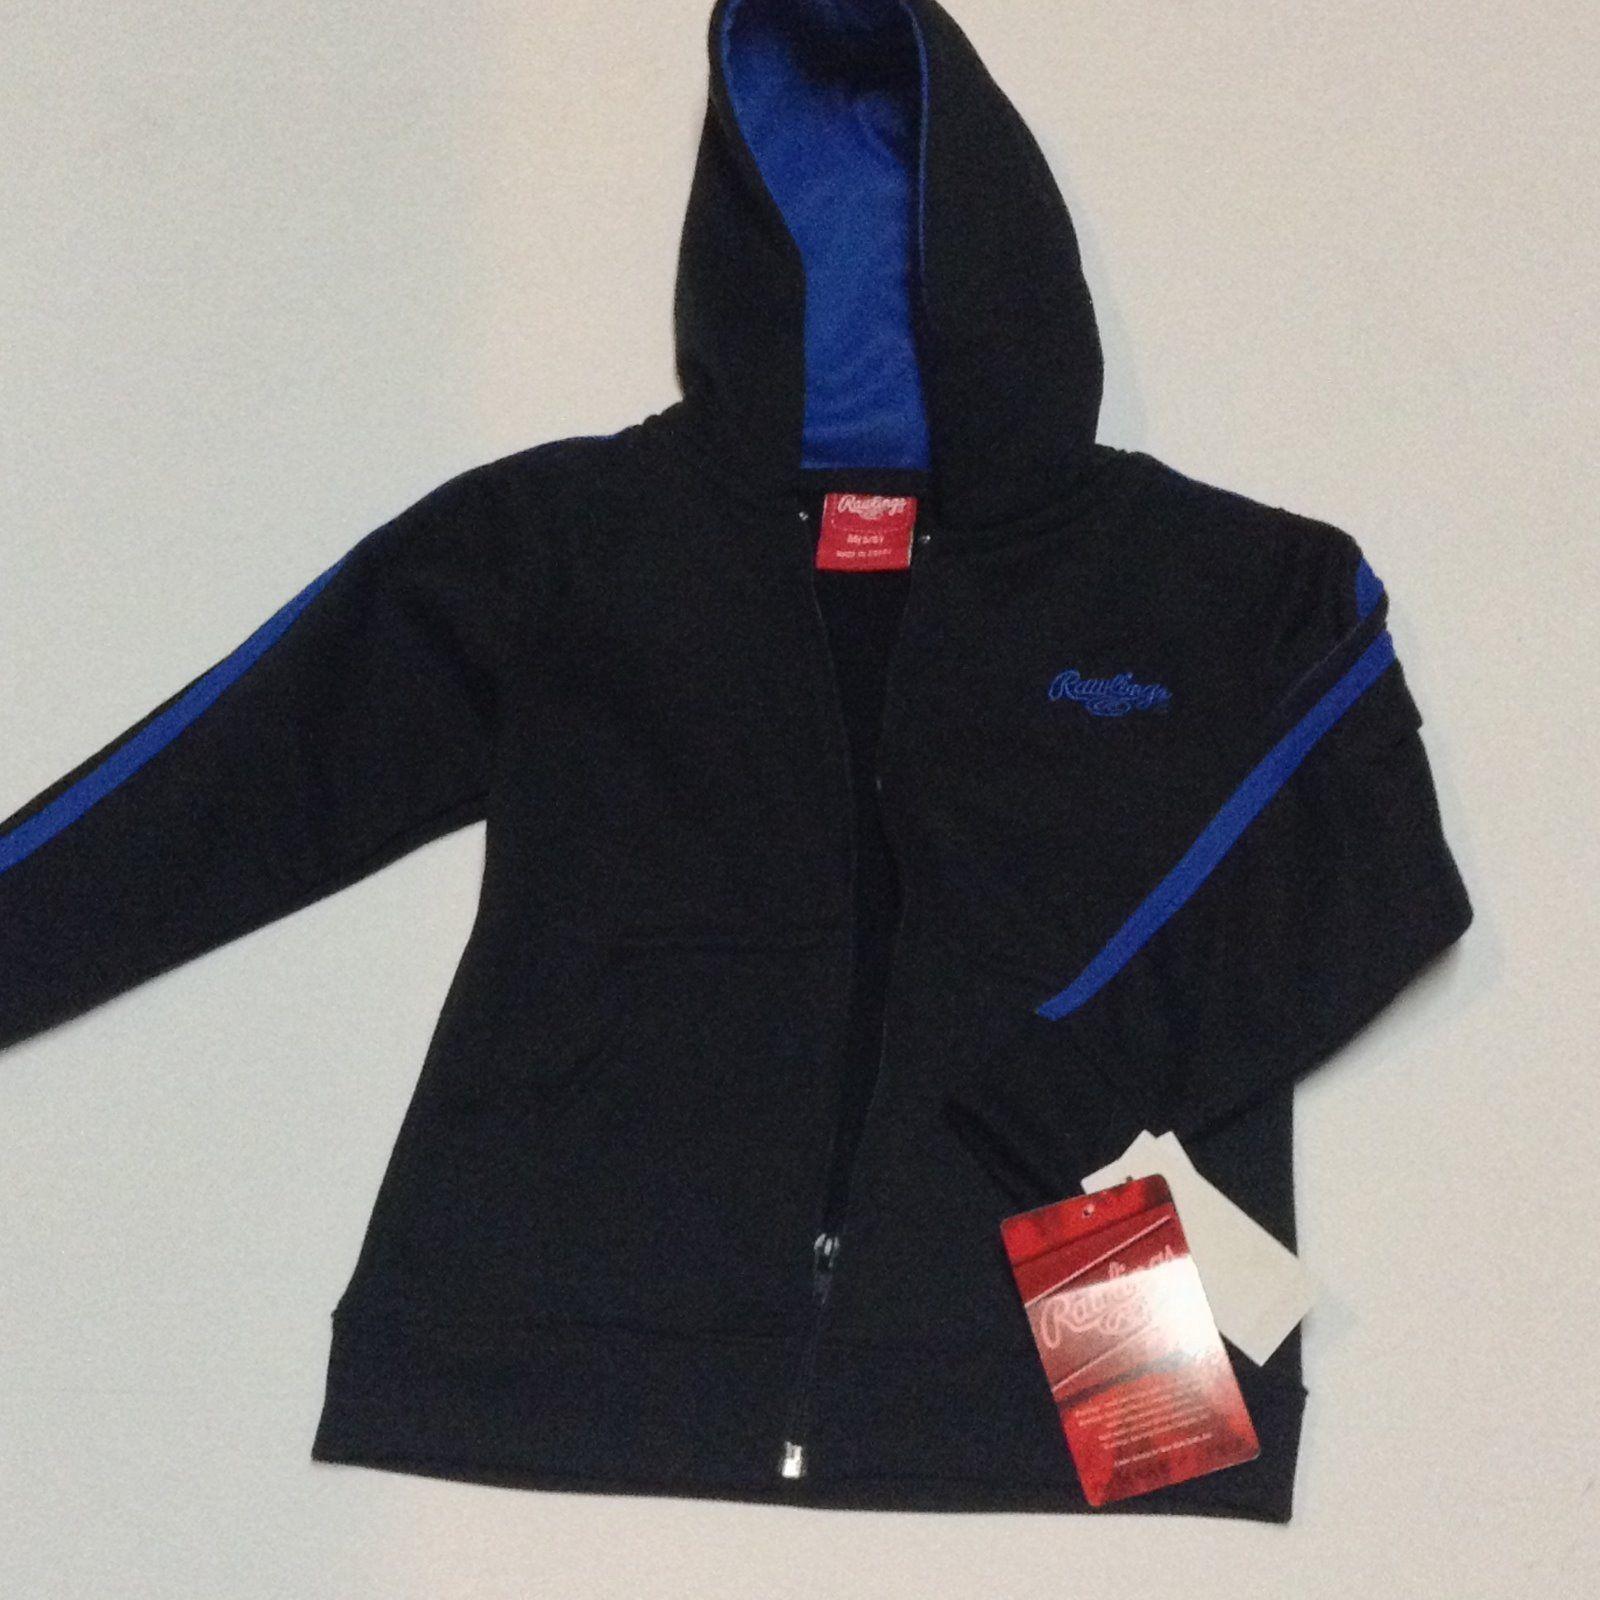 Rawlings Hooded Jacket Youth Sz M 5/6 NWT Black Blue Logo